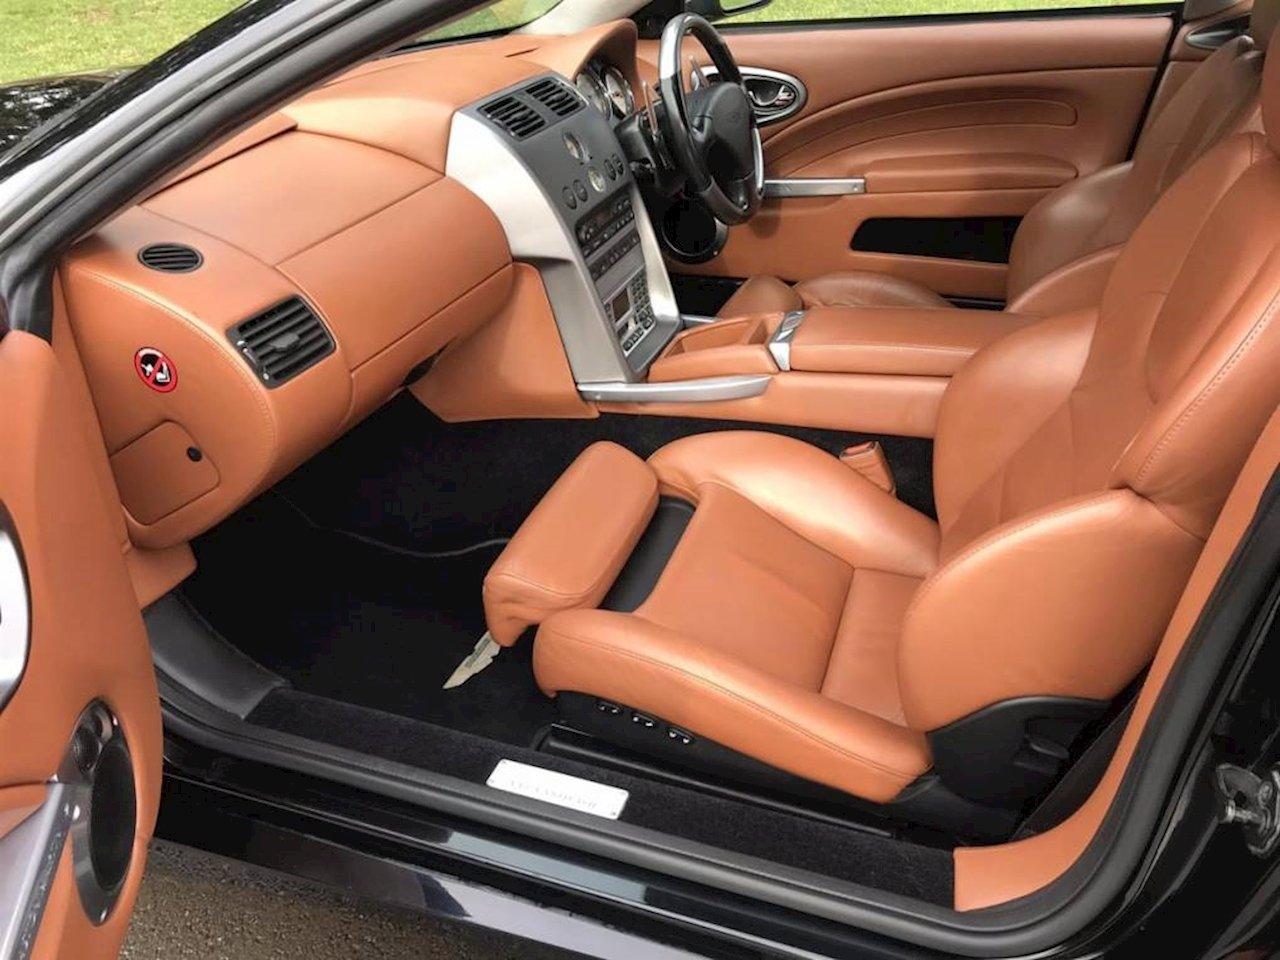 2004 Aston Martin Vanquish - 2002 - Jet Black  For Sale (picture 2 of 5)